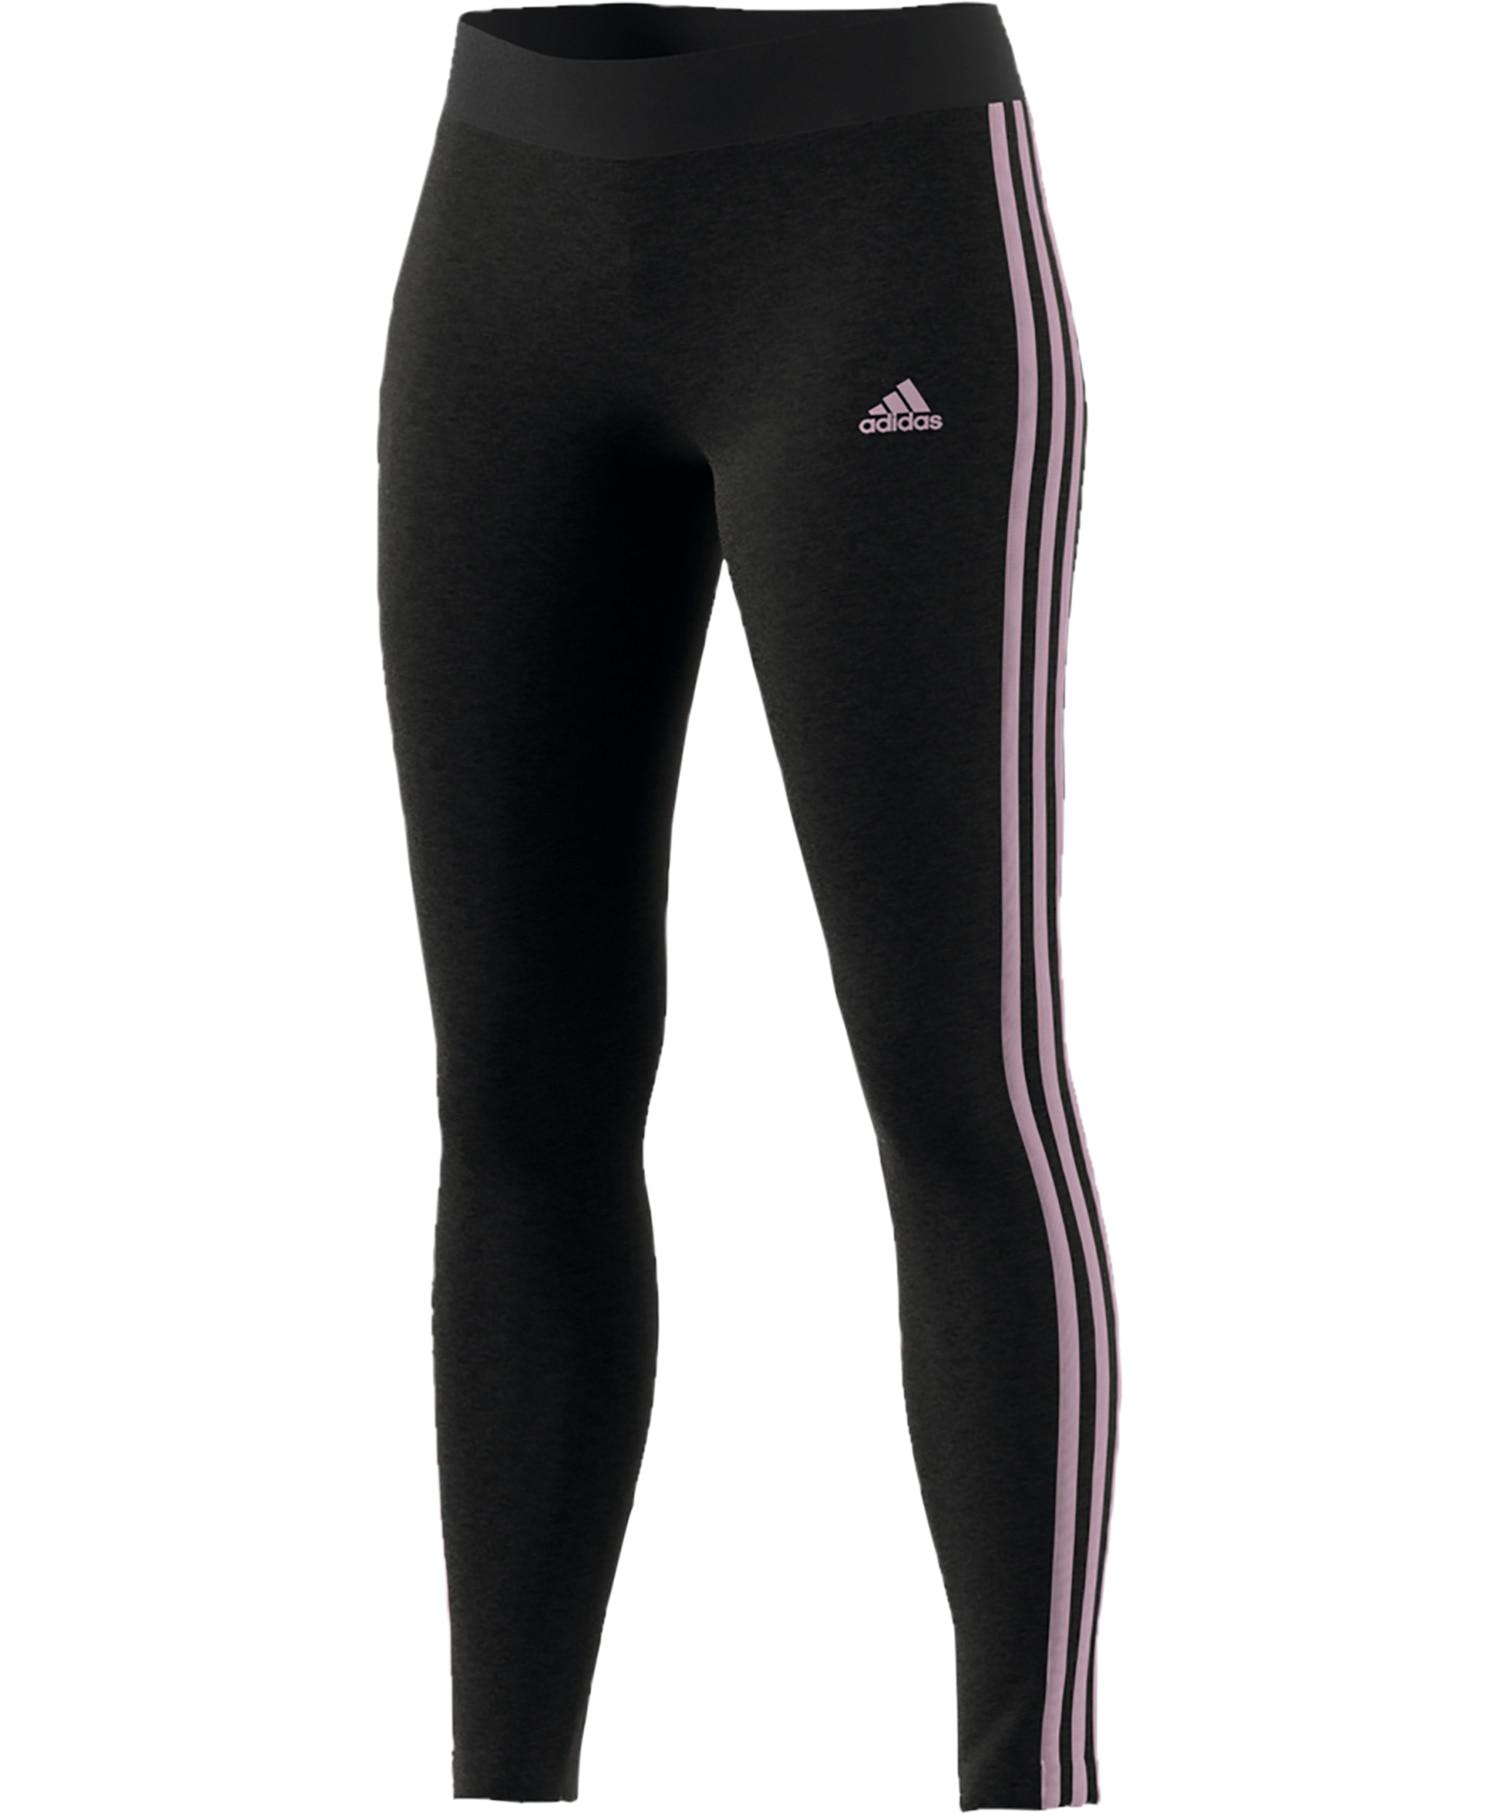 Adidas 3s leg tights